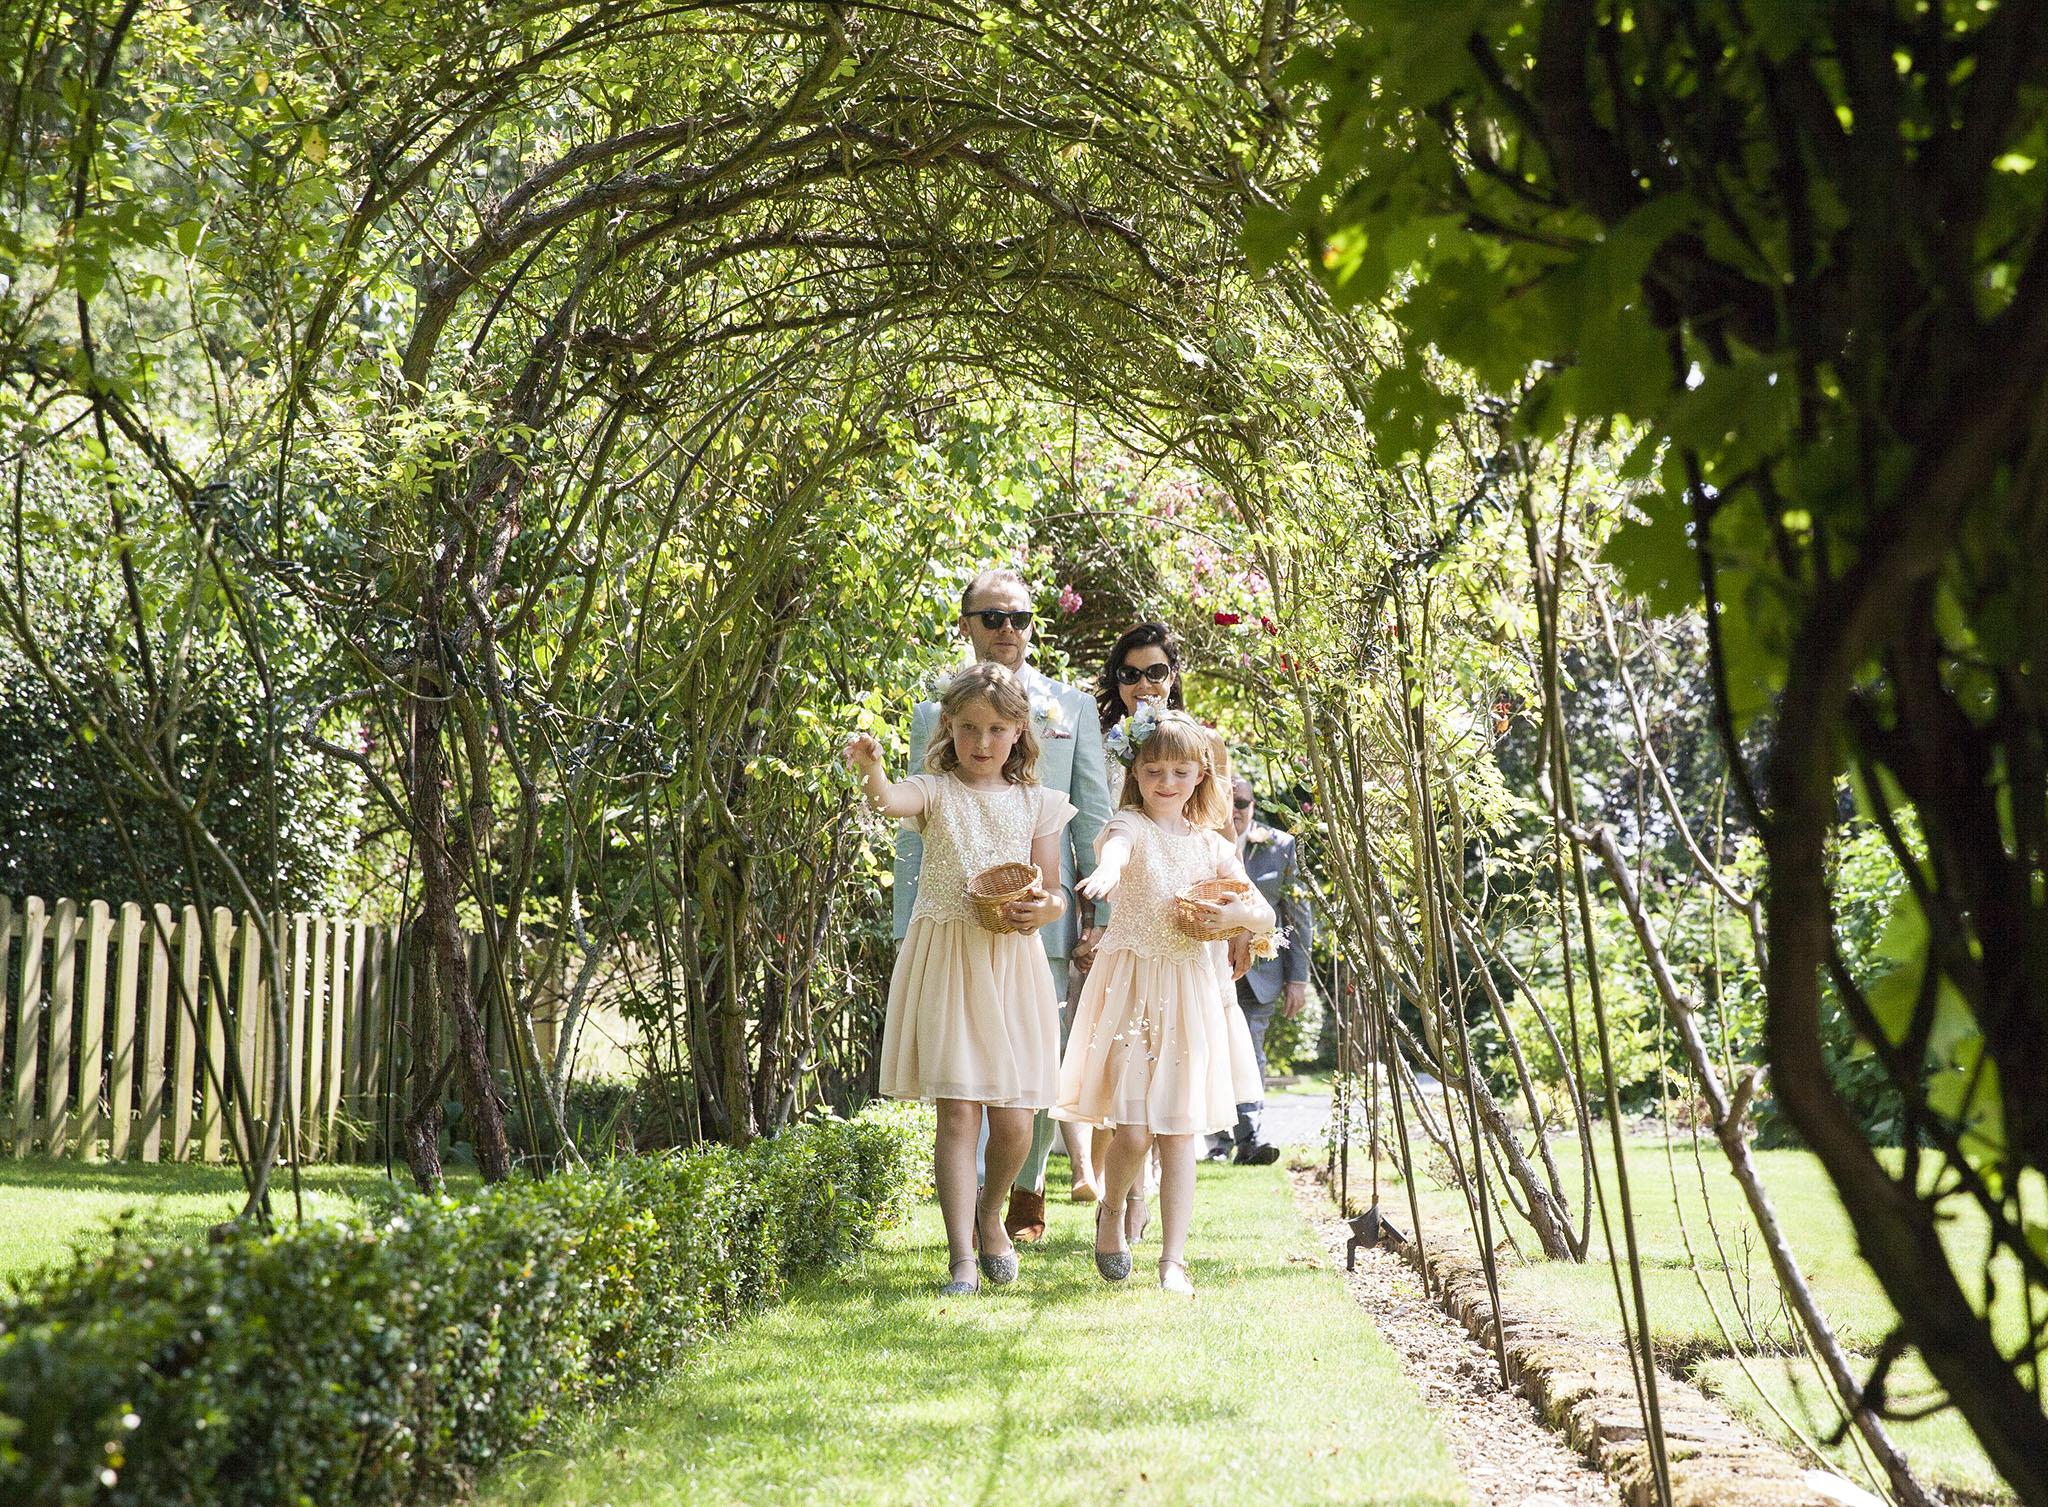 elizabethgphotography_kingslangley_hertfordshire_fineart_wedding_pottersbar_matt_katie_pegg_20.jpg